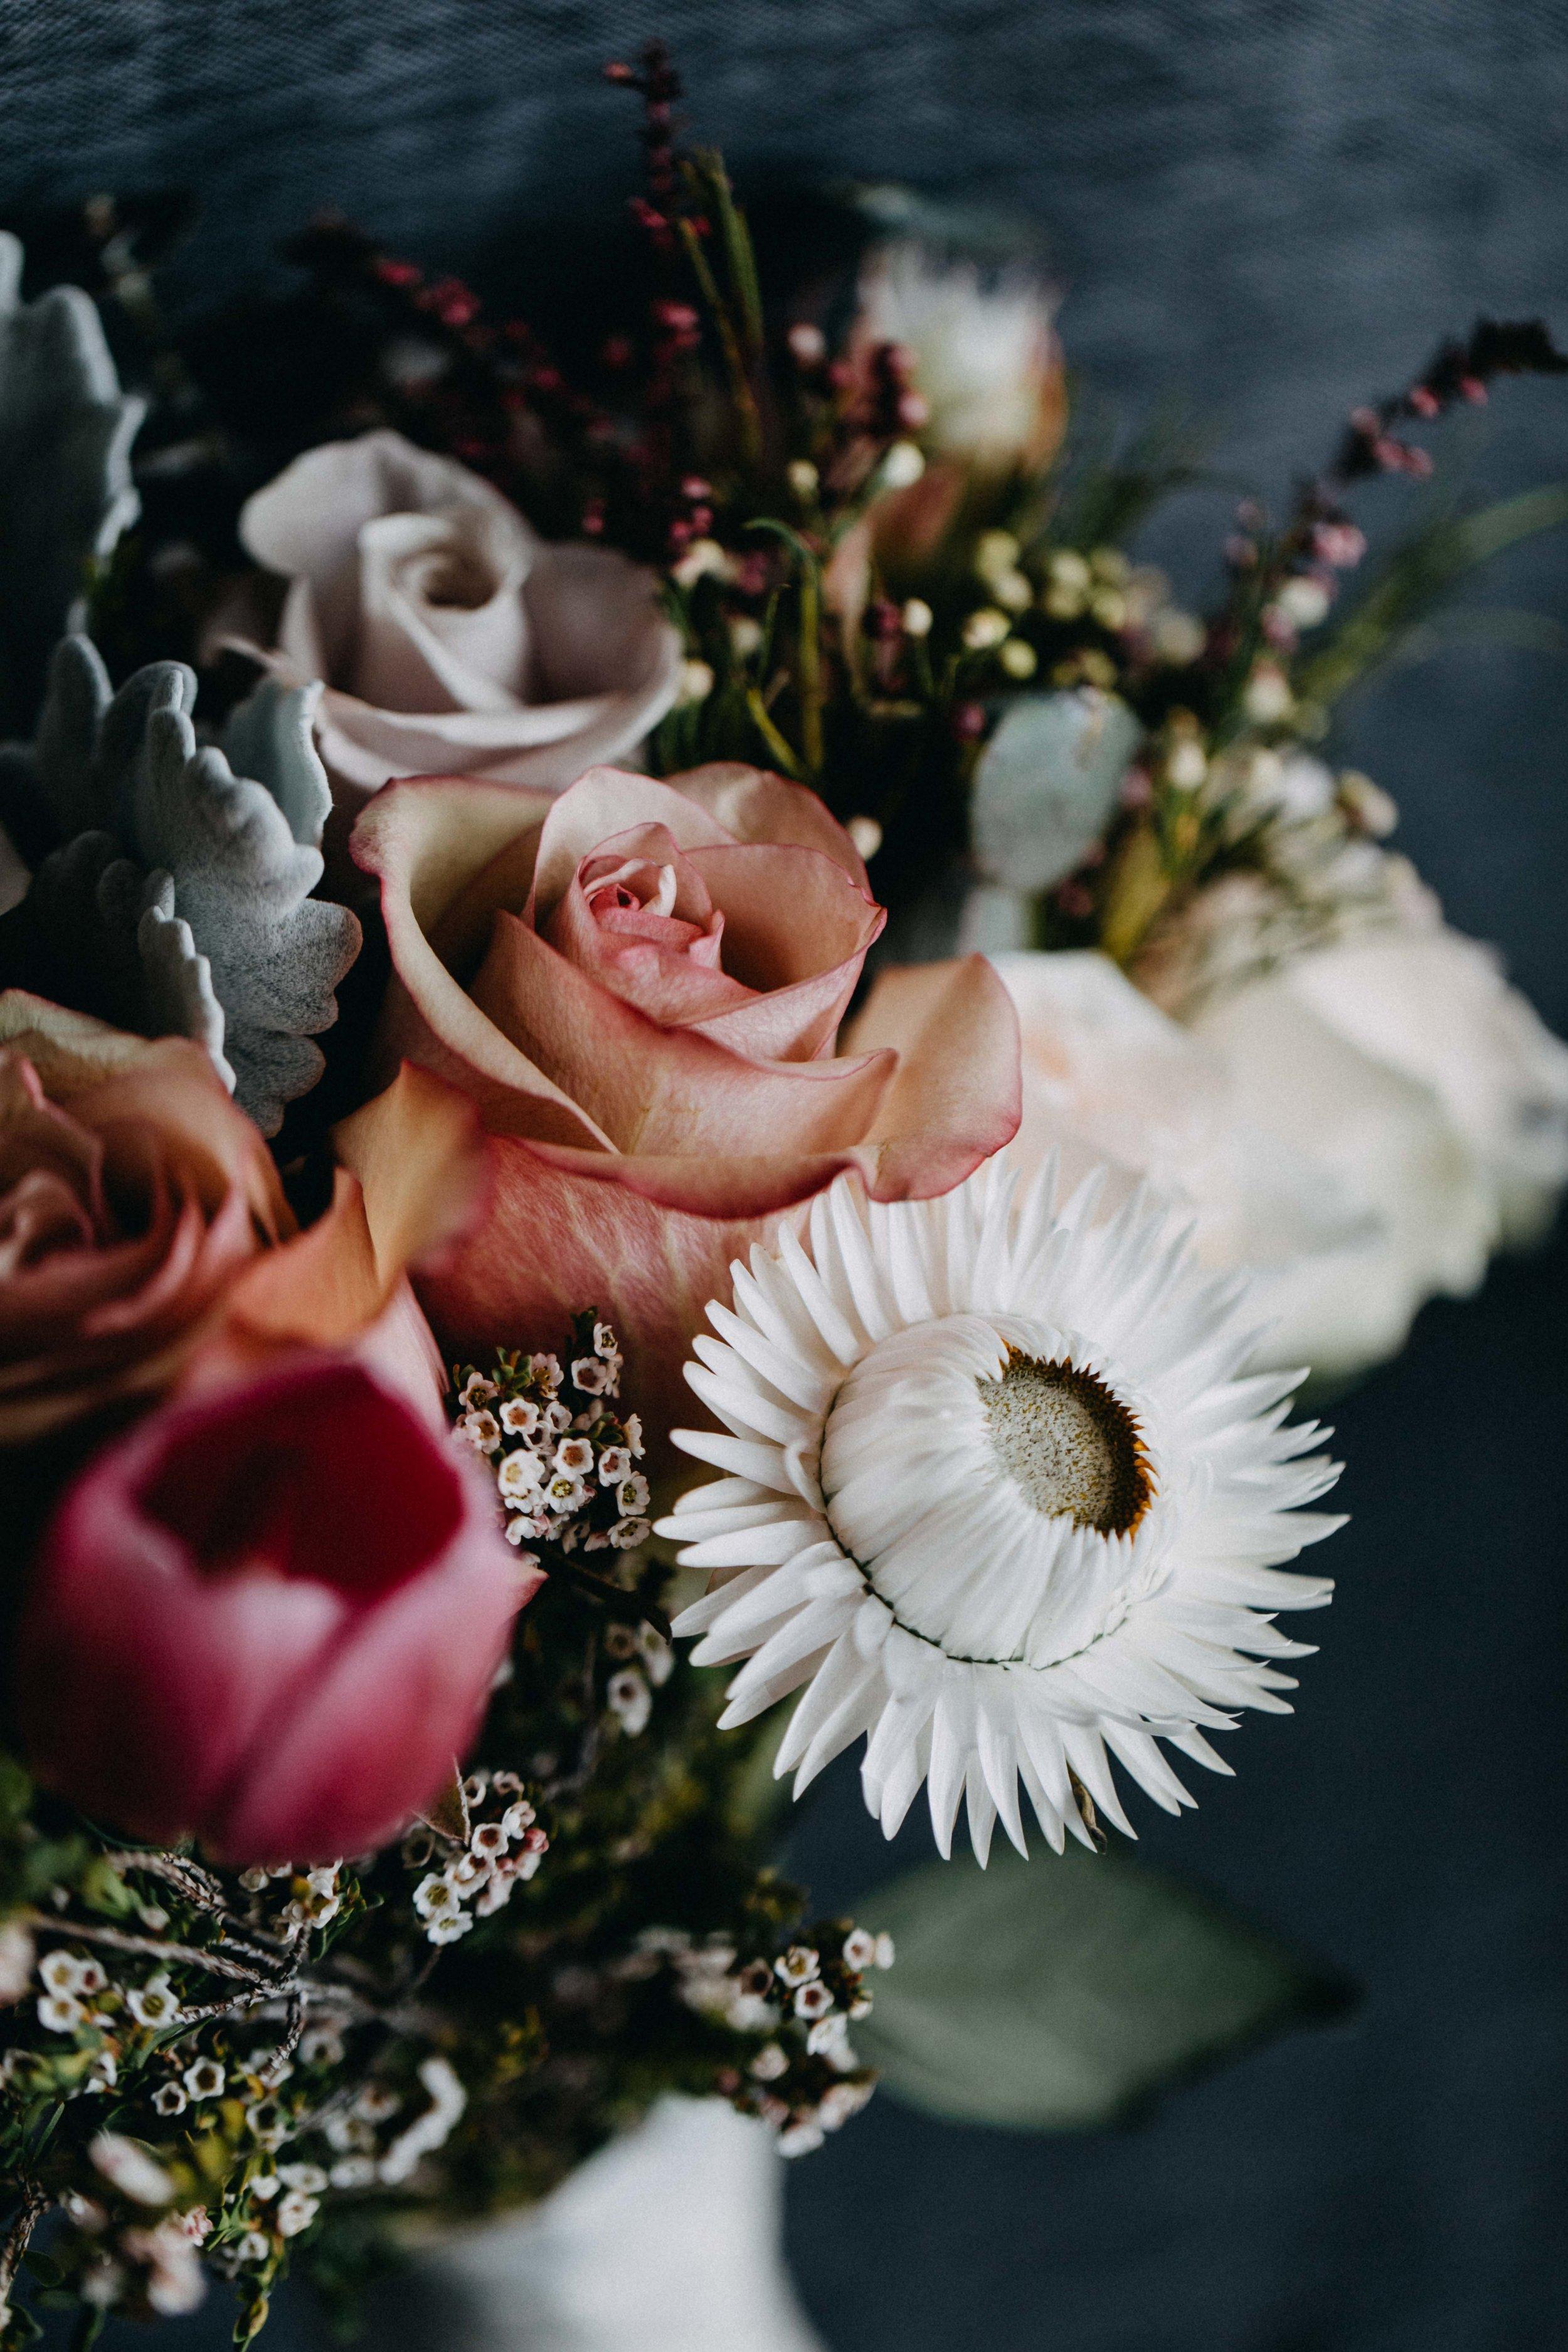 appin-house-wedding-macarthur-www.emilyobrienphotography.net-10.jpg